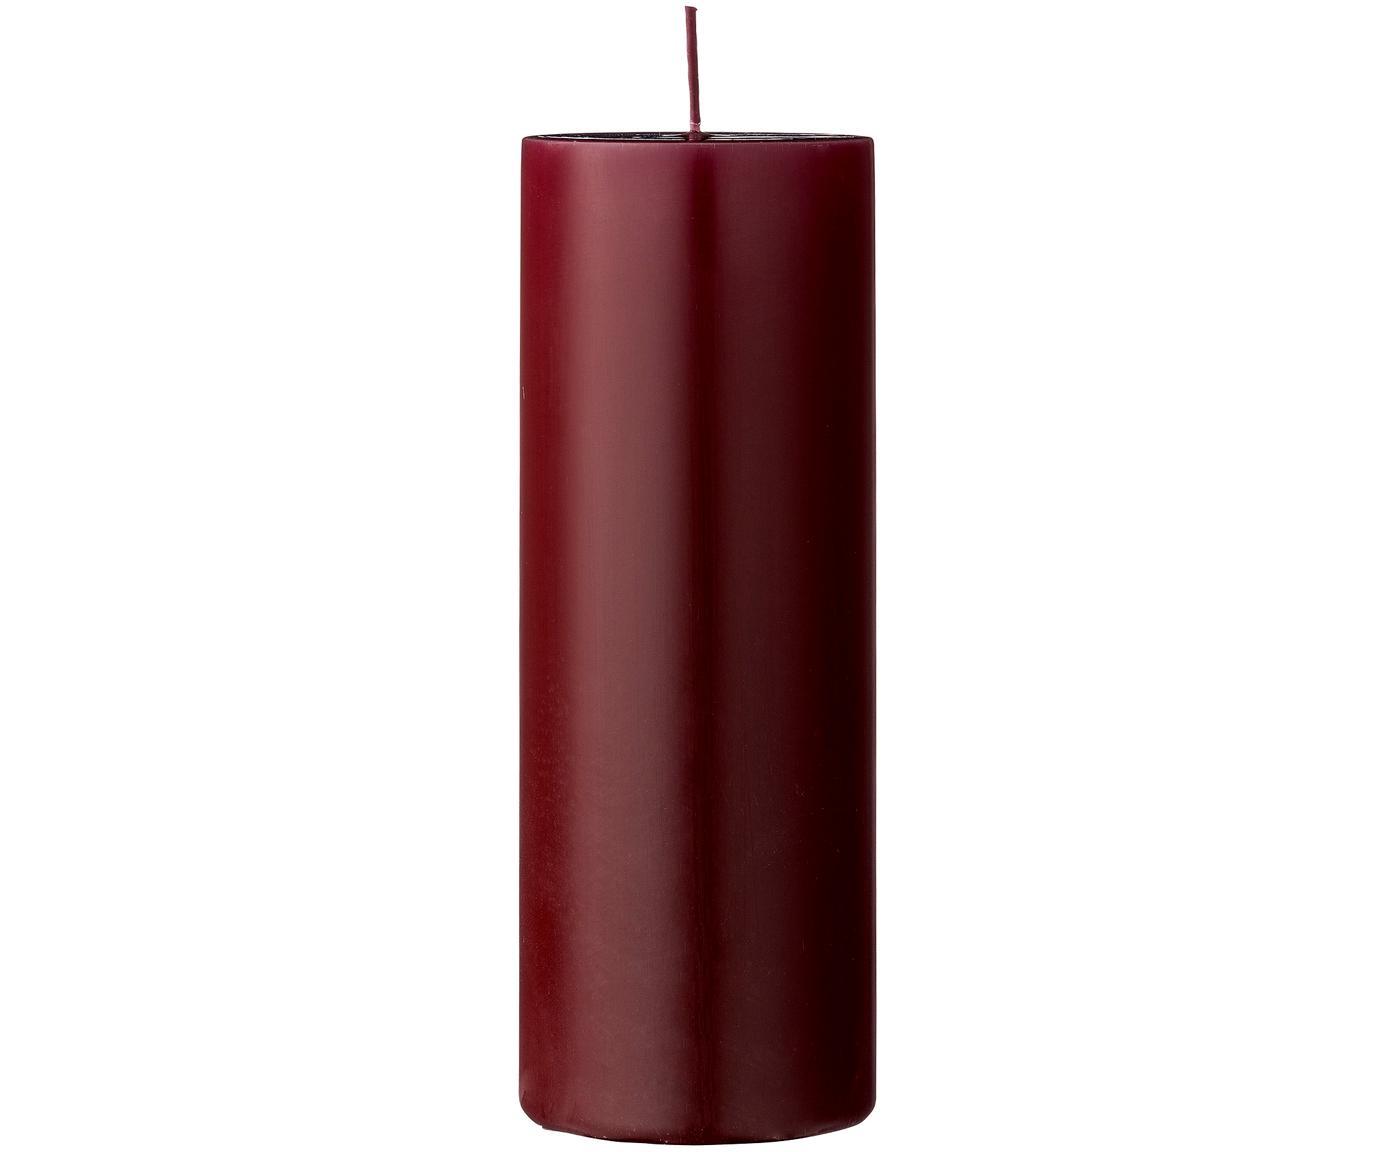 Stumpenkerze Lulu, Wachs, Rot, Ø 7 x H 20 cm